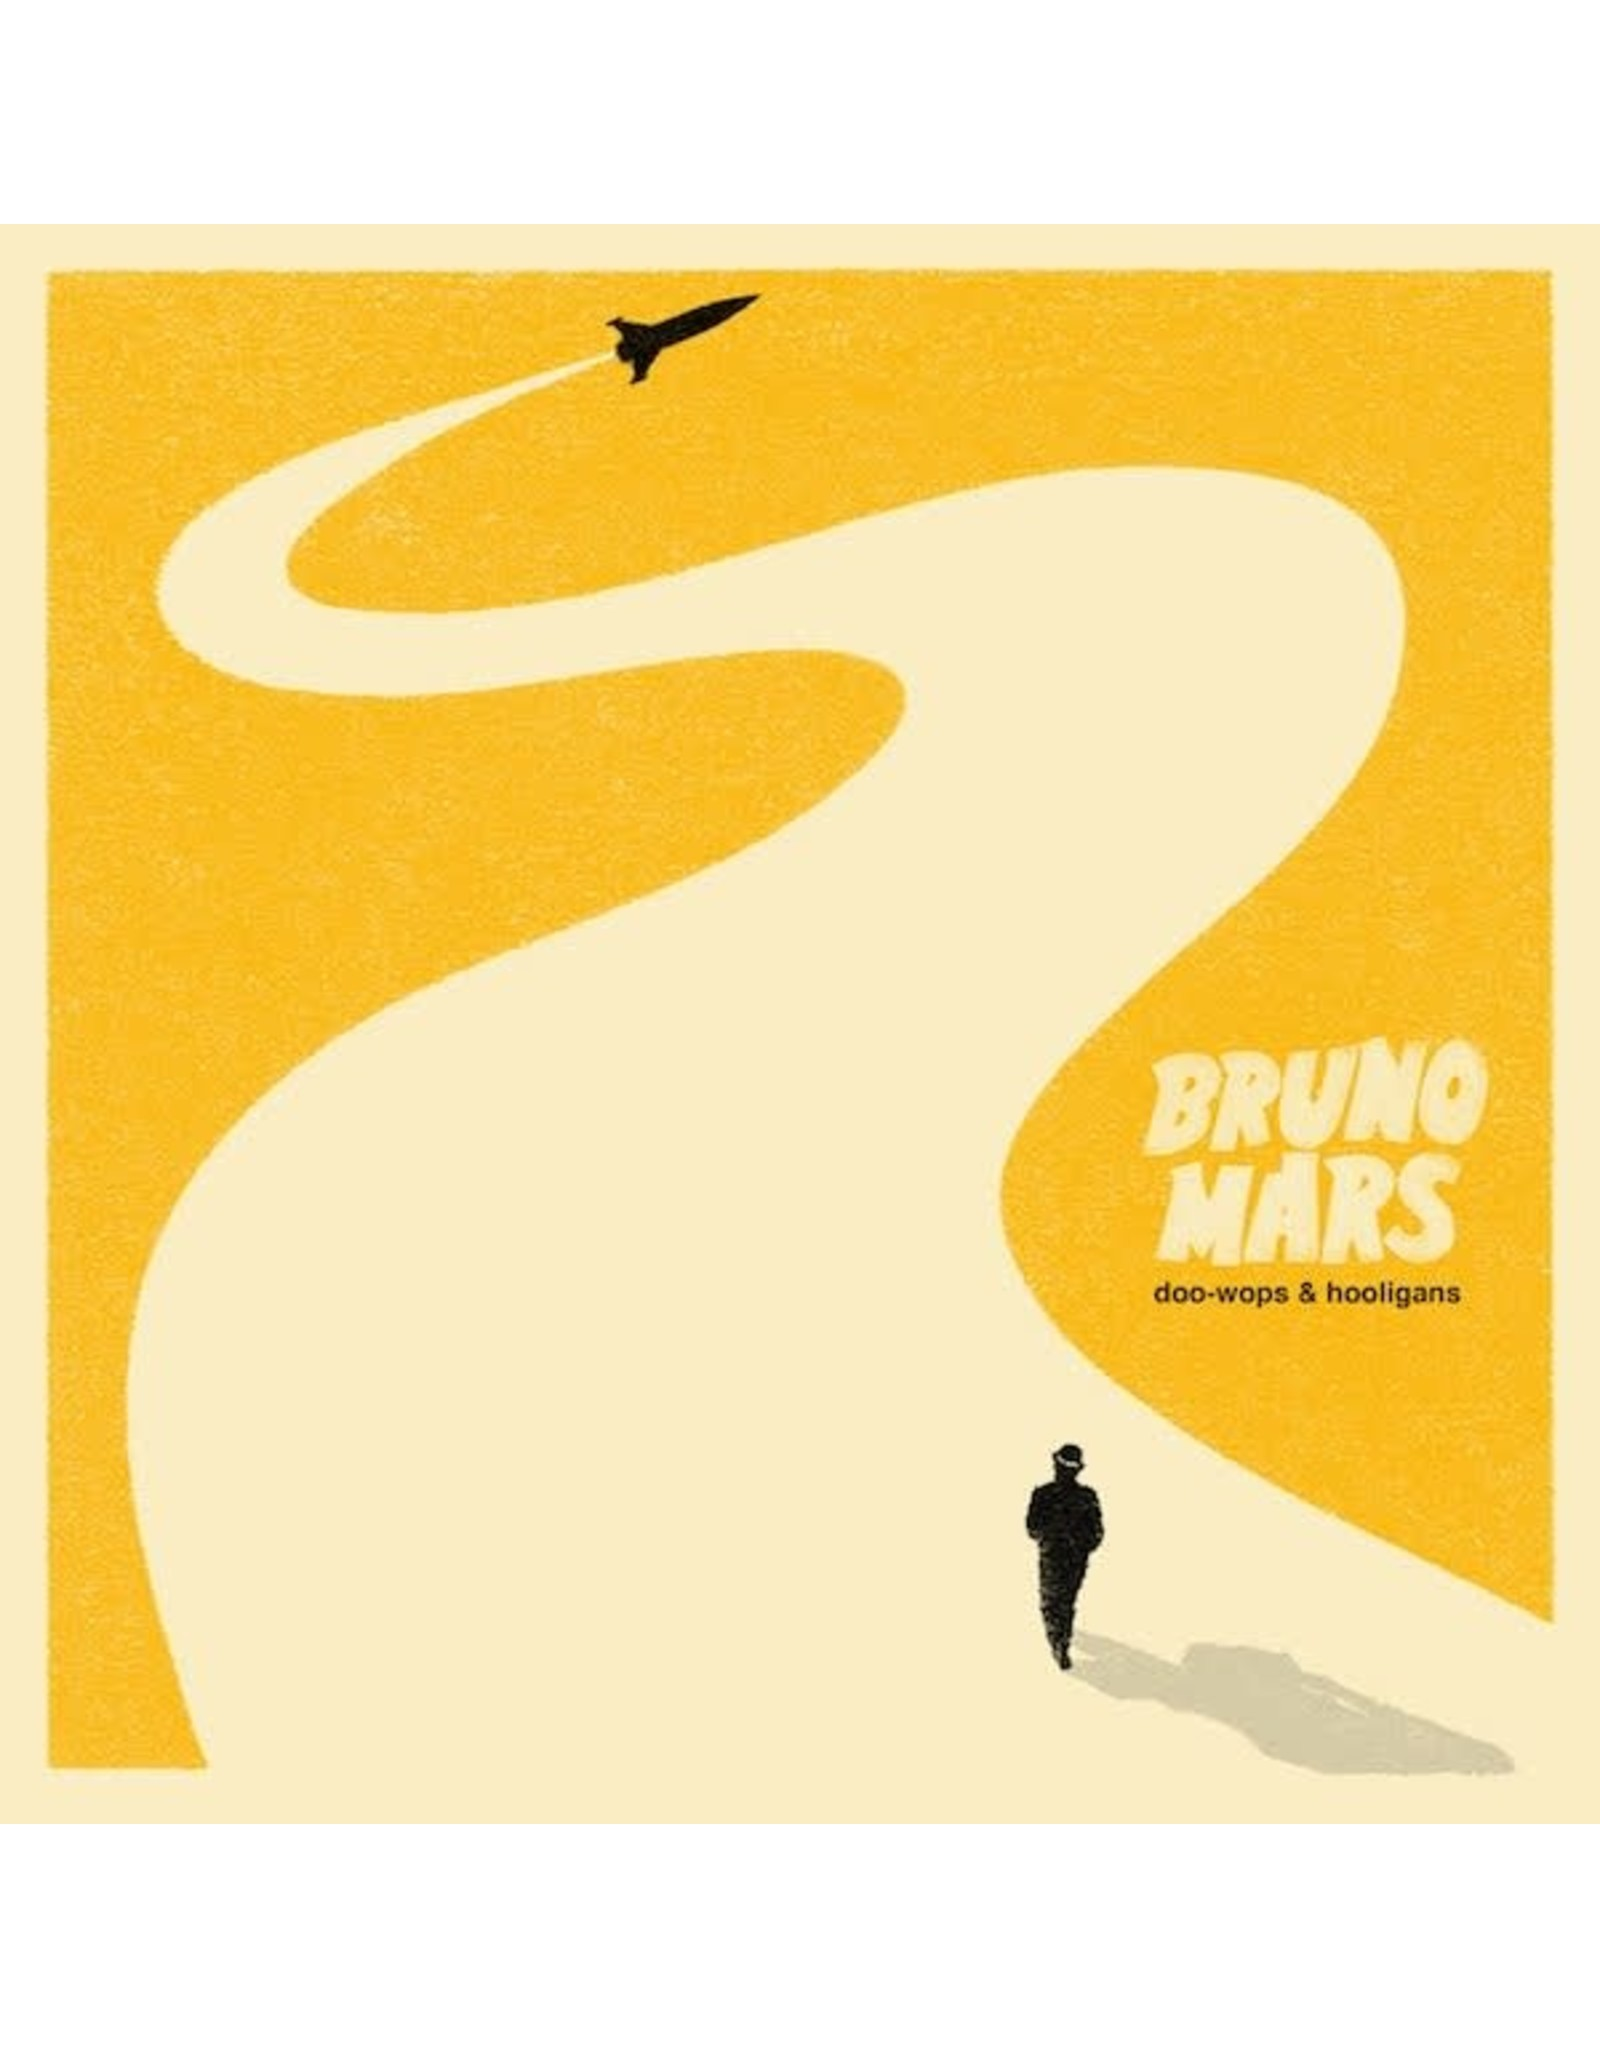 Bruno Mars - Doo Wops & Hooligans (10th Anniversary) [Orange Vinyl]